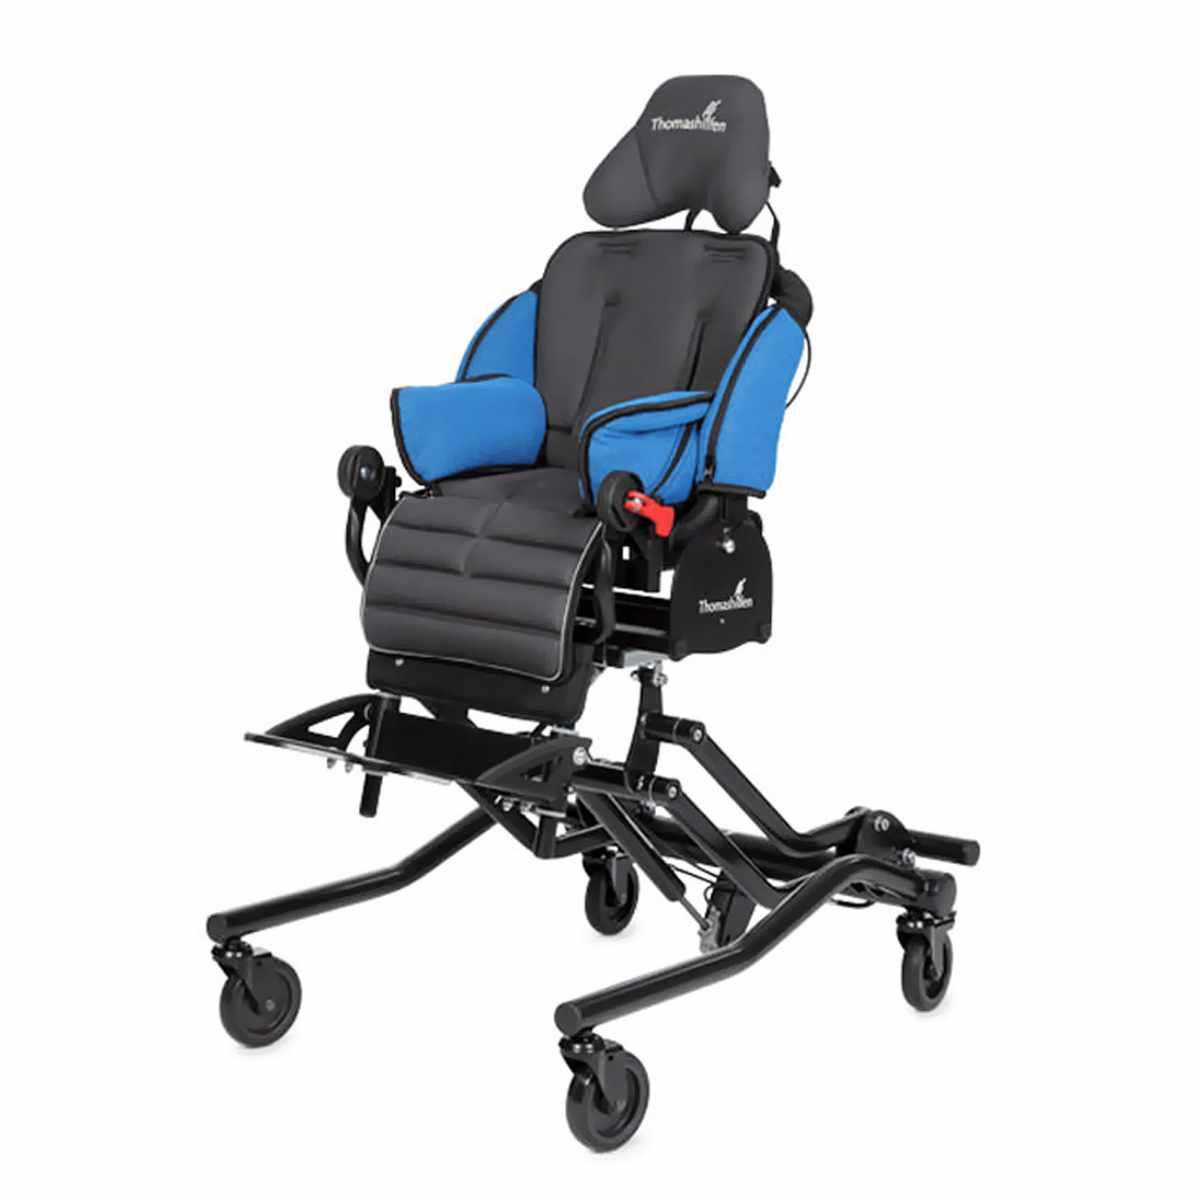 Thomashilfen EASyS modular S seating system (Q-Chassis)